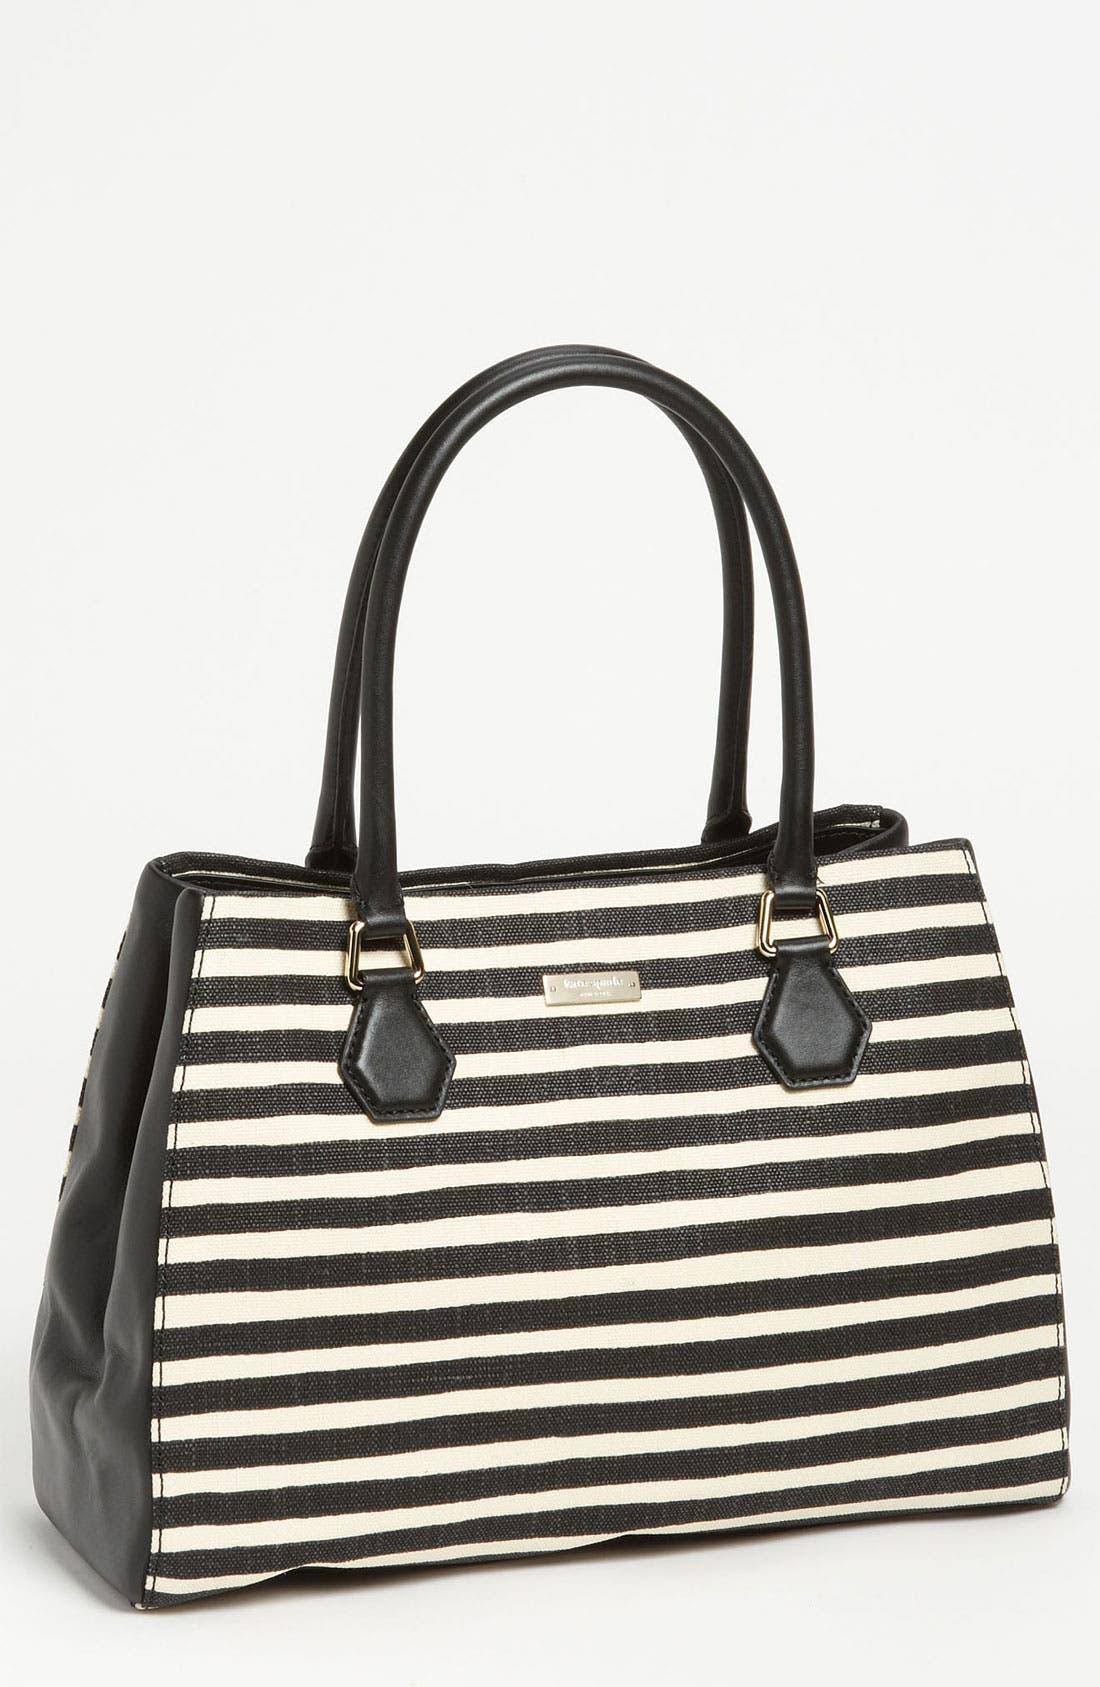 Main Image - kate spade new york 'catherine street - stripe louise' shoulder bag